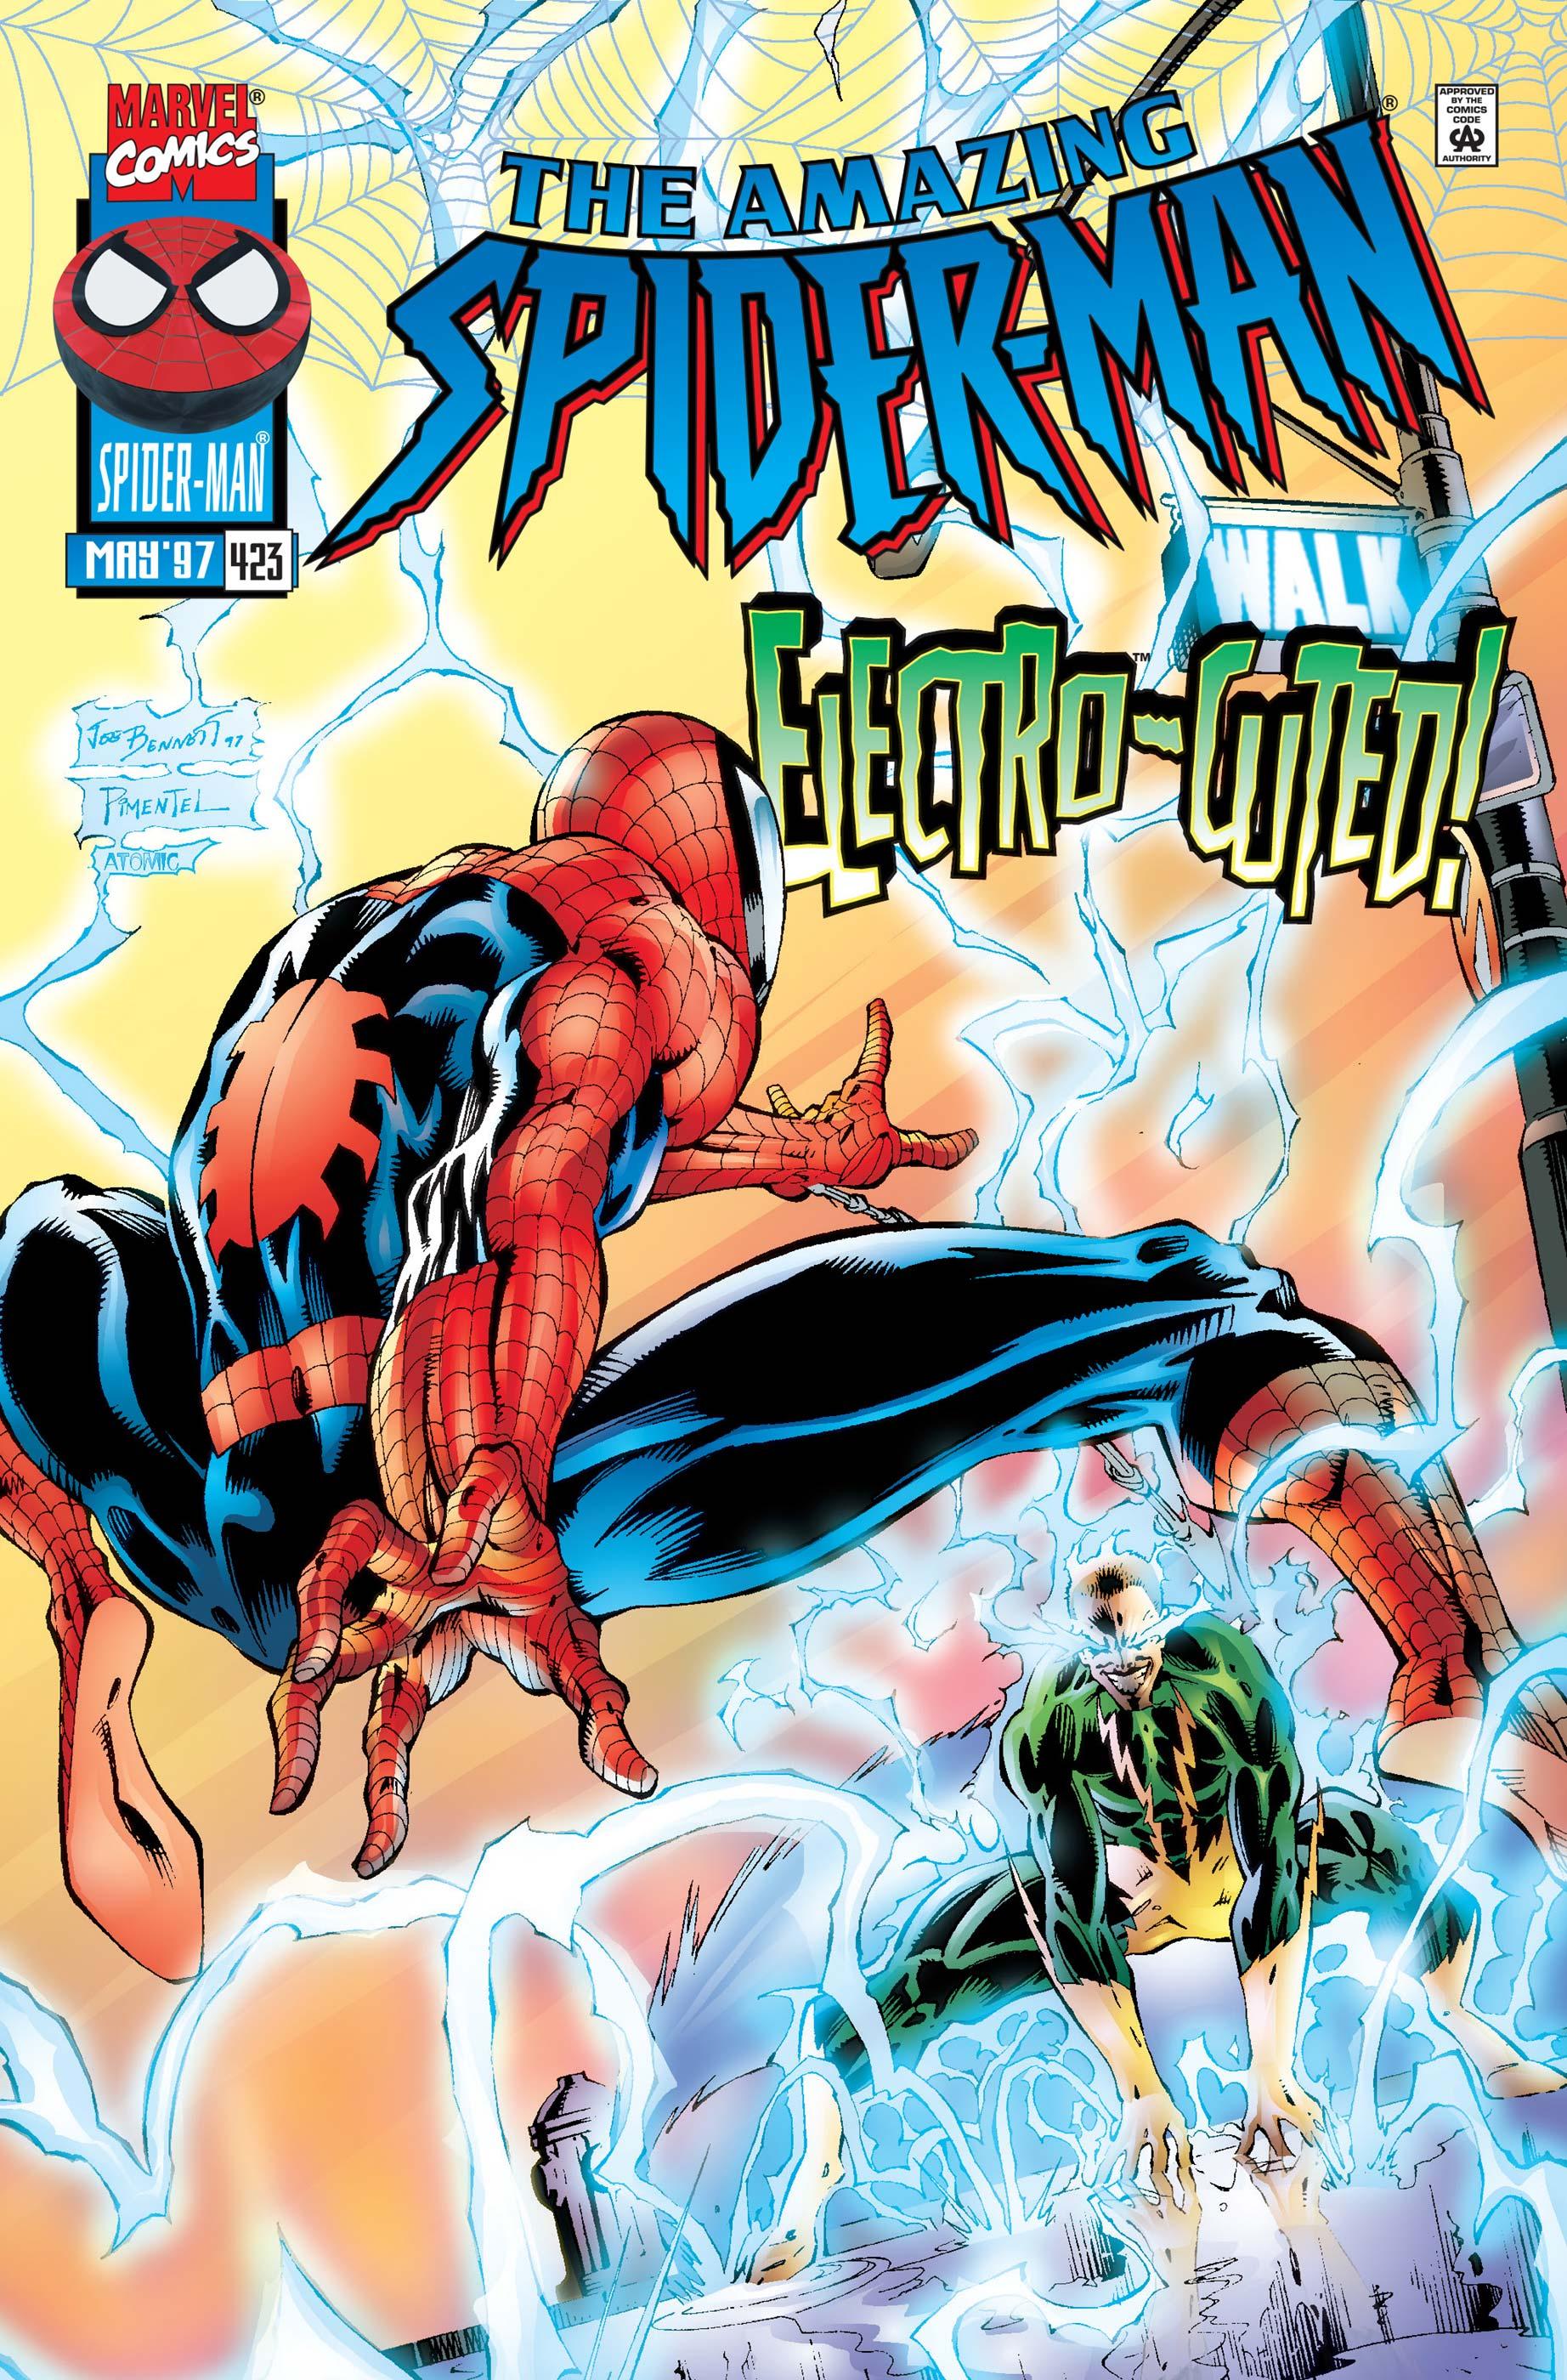 The Amazing Spider-Man (1963) #423